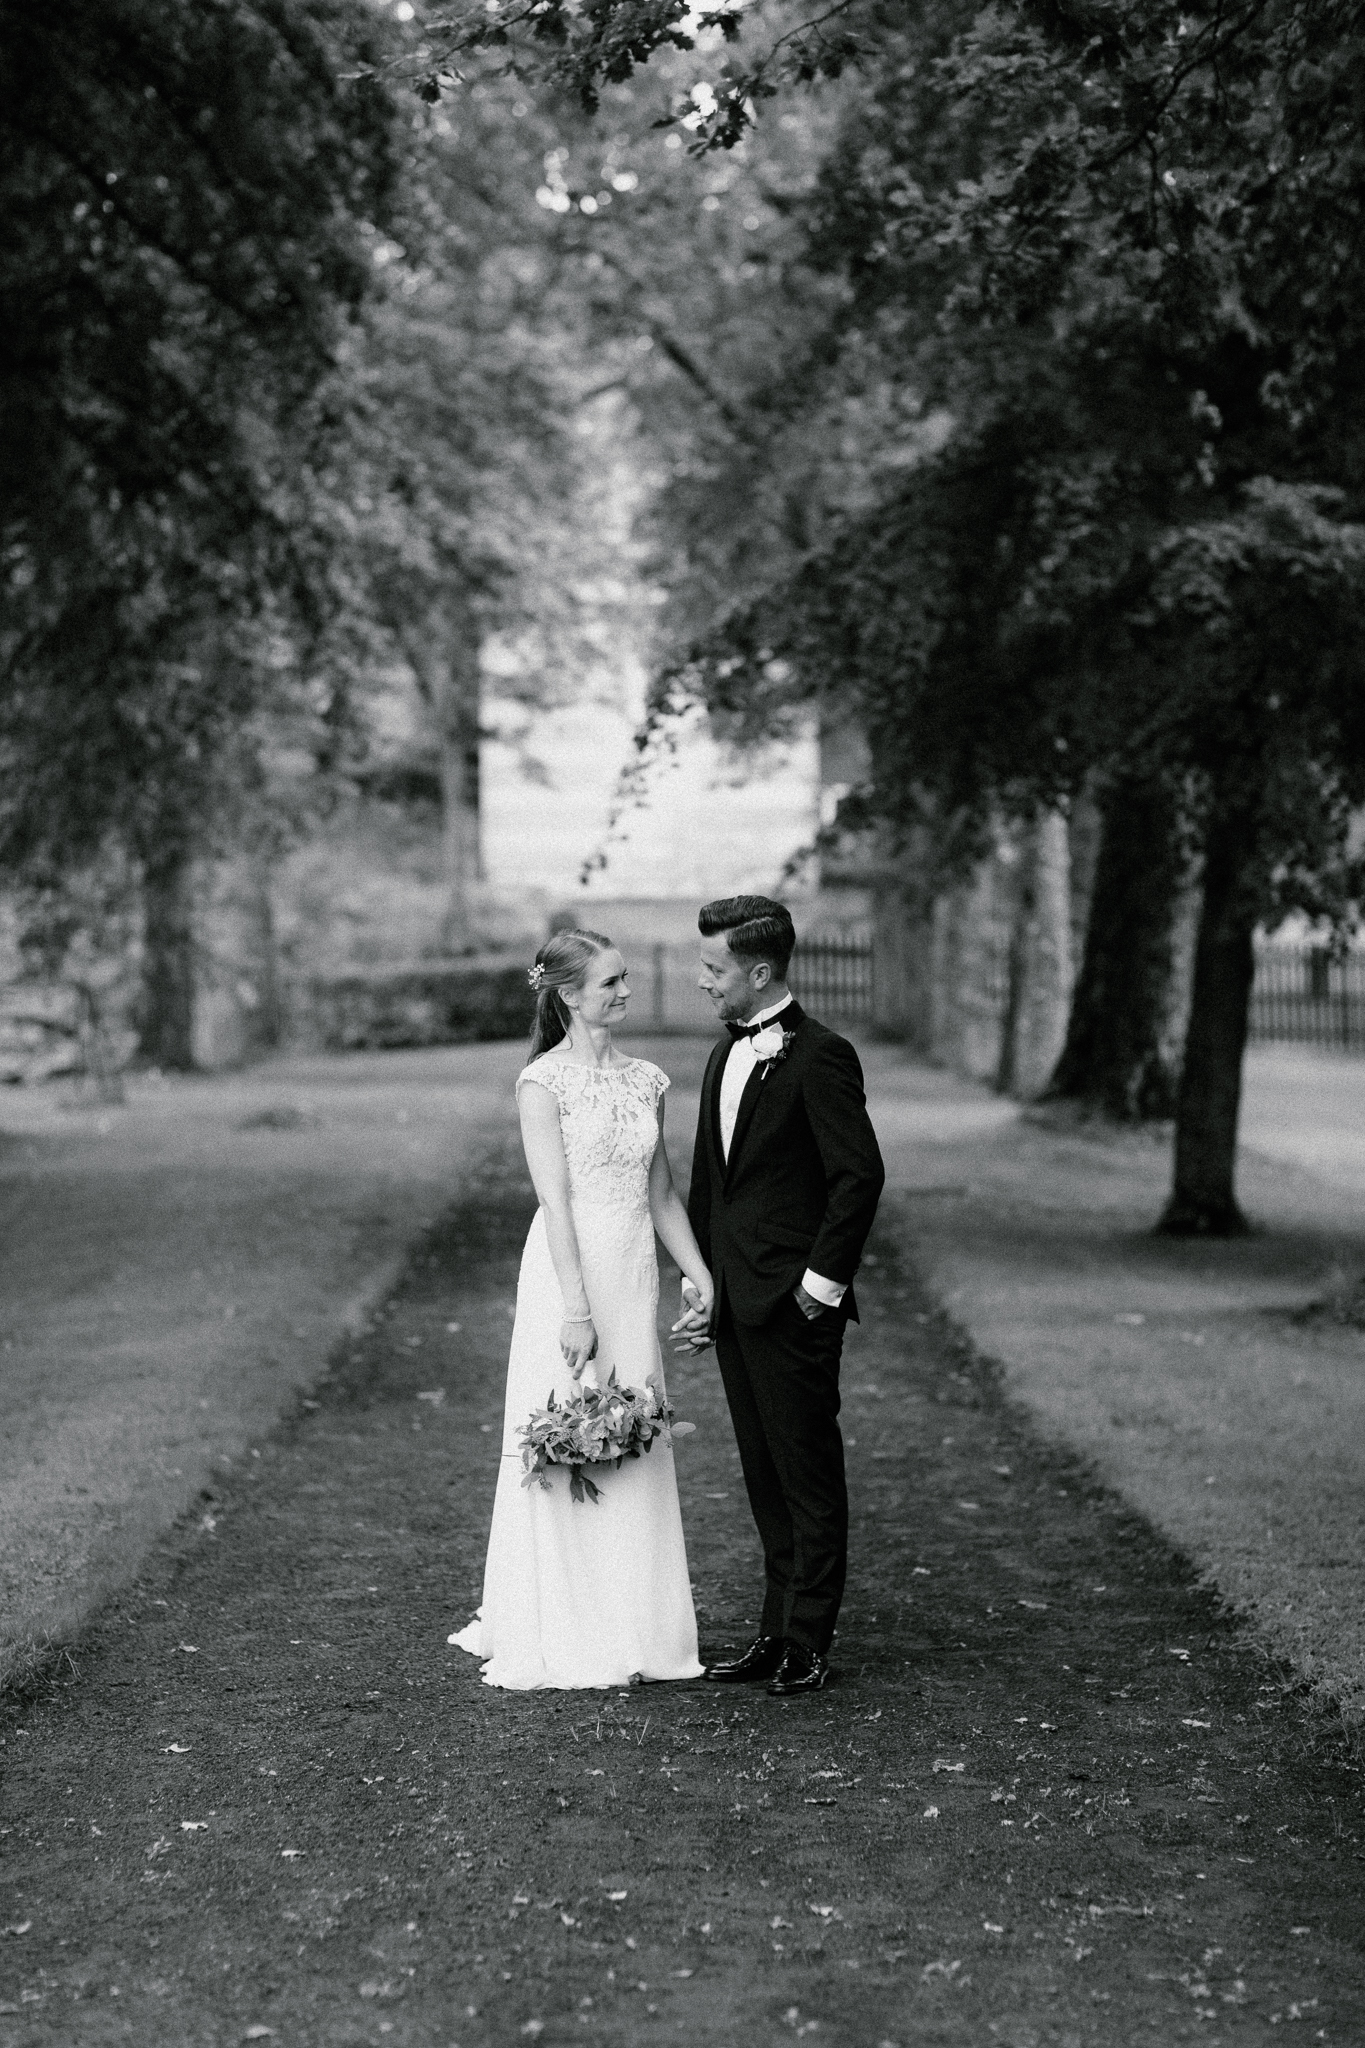 Jessica + Patrick | Fagervik | by Patrick Karkkolainen Wedding Photography-40.jpg